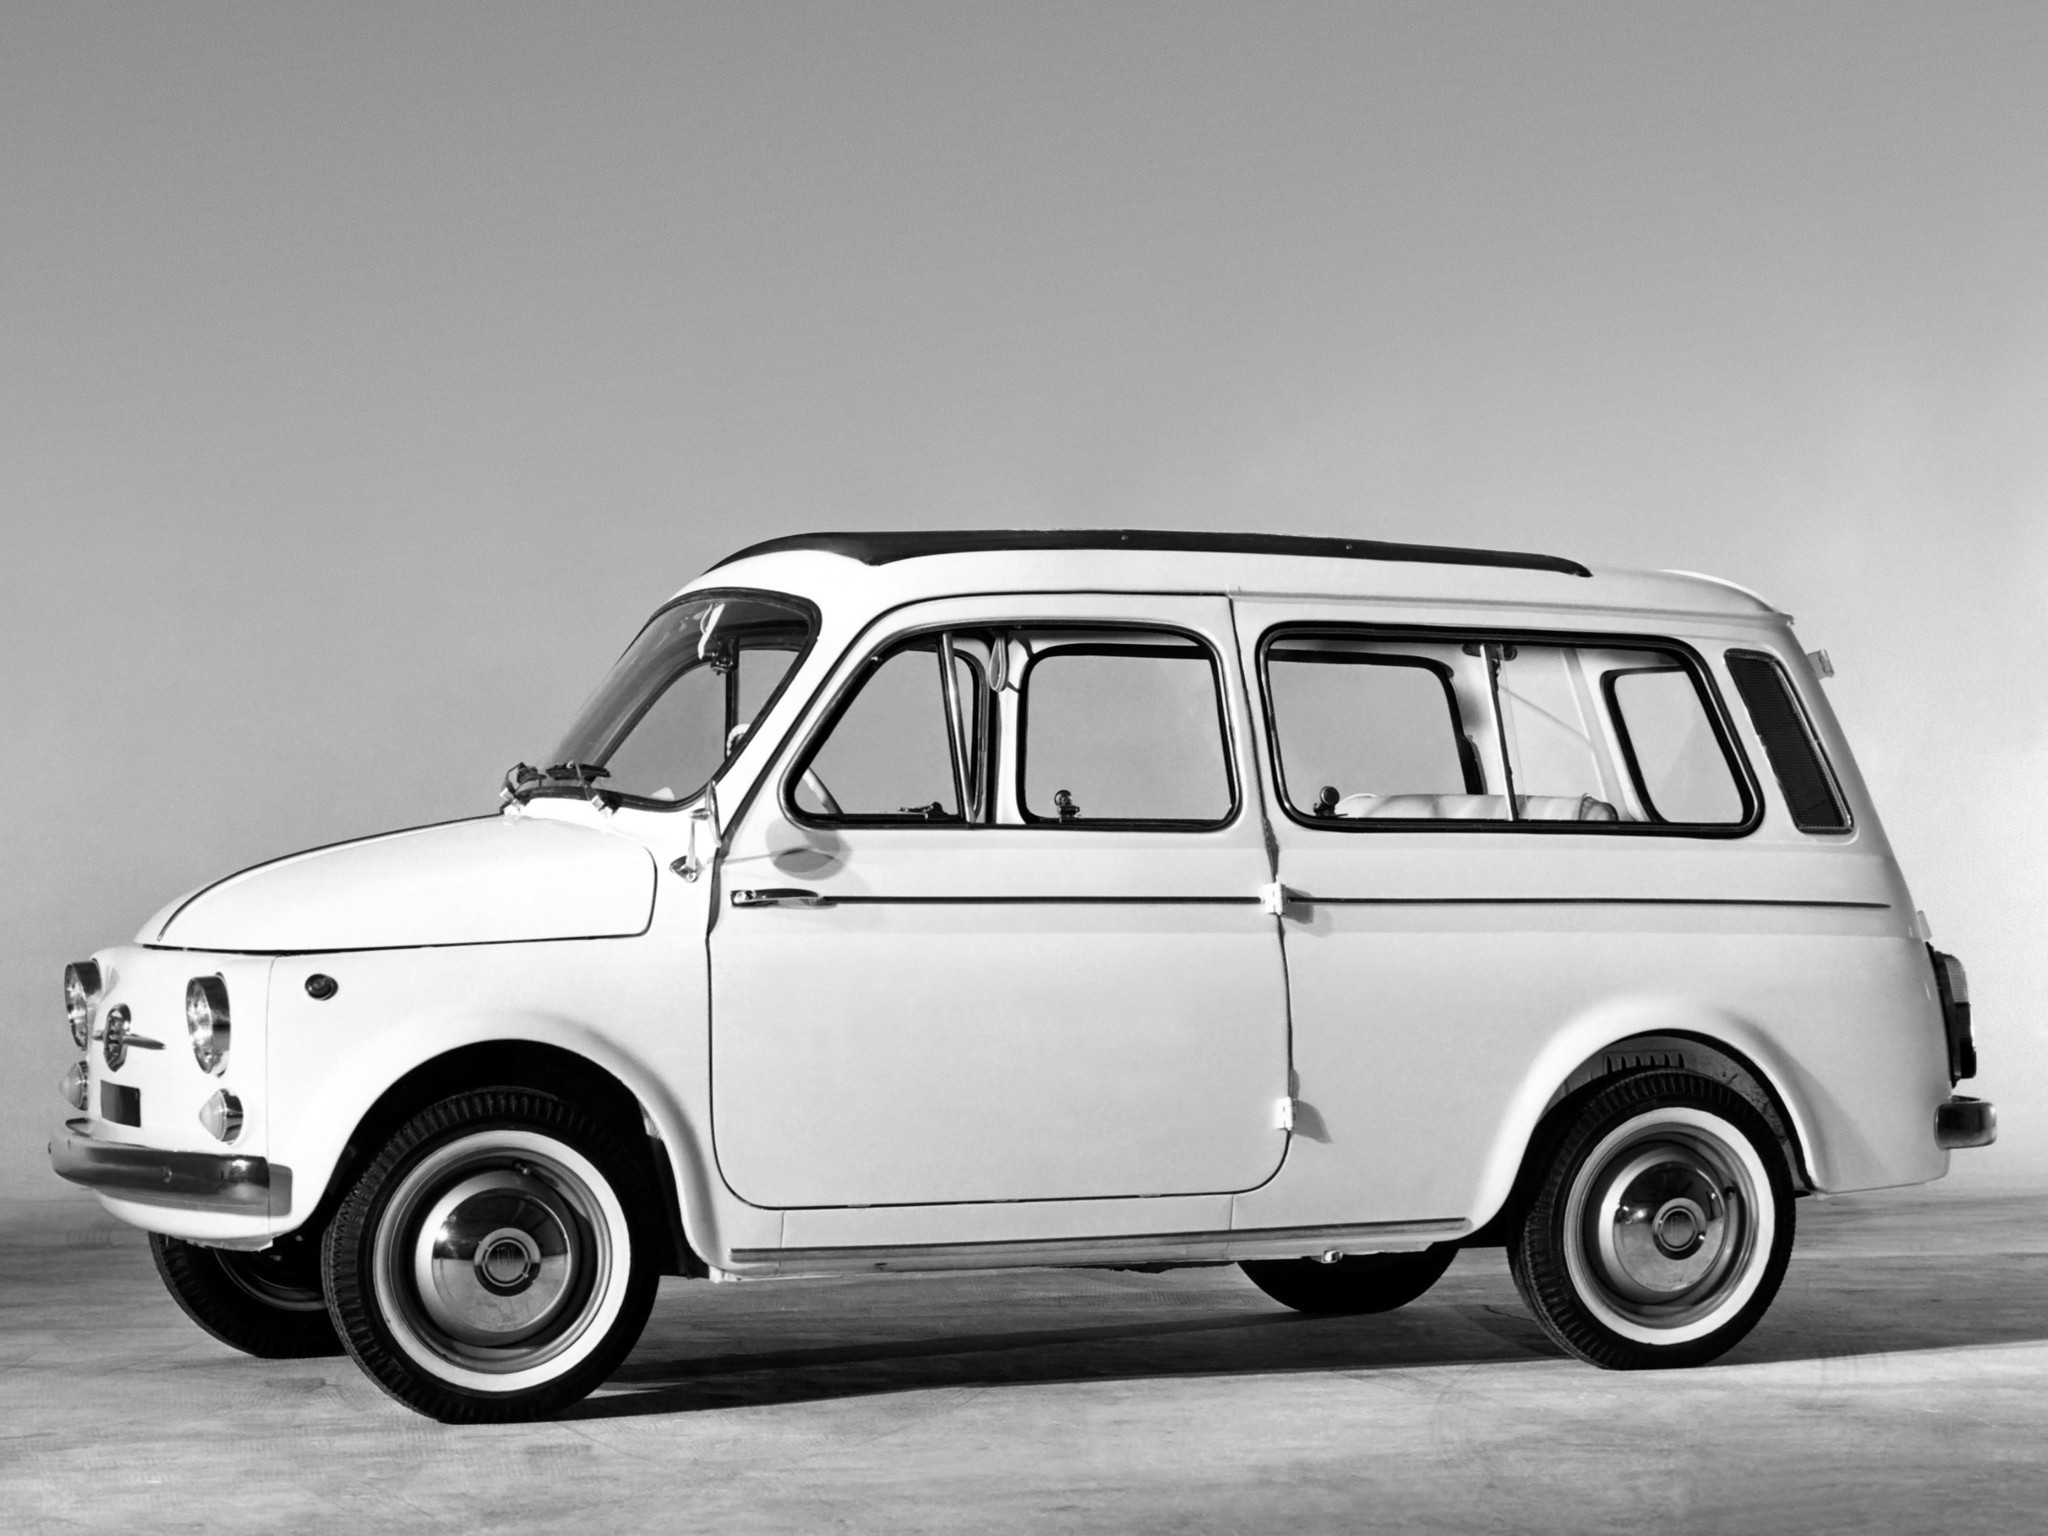 fiat 500 k giardiniera 1960 1961 1962 1963 1964 1965 1966 1967 1968 1969 1970 1971. Black Bedroom Furniture Sets. Home Design Ideas